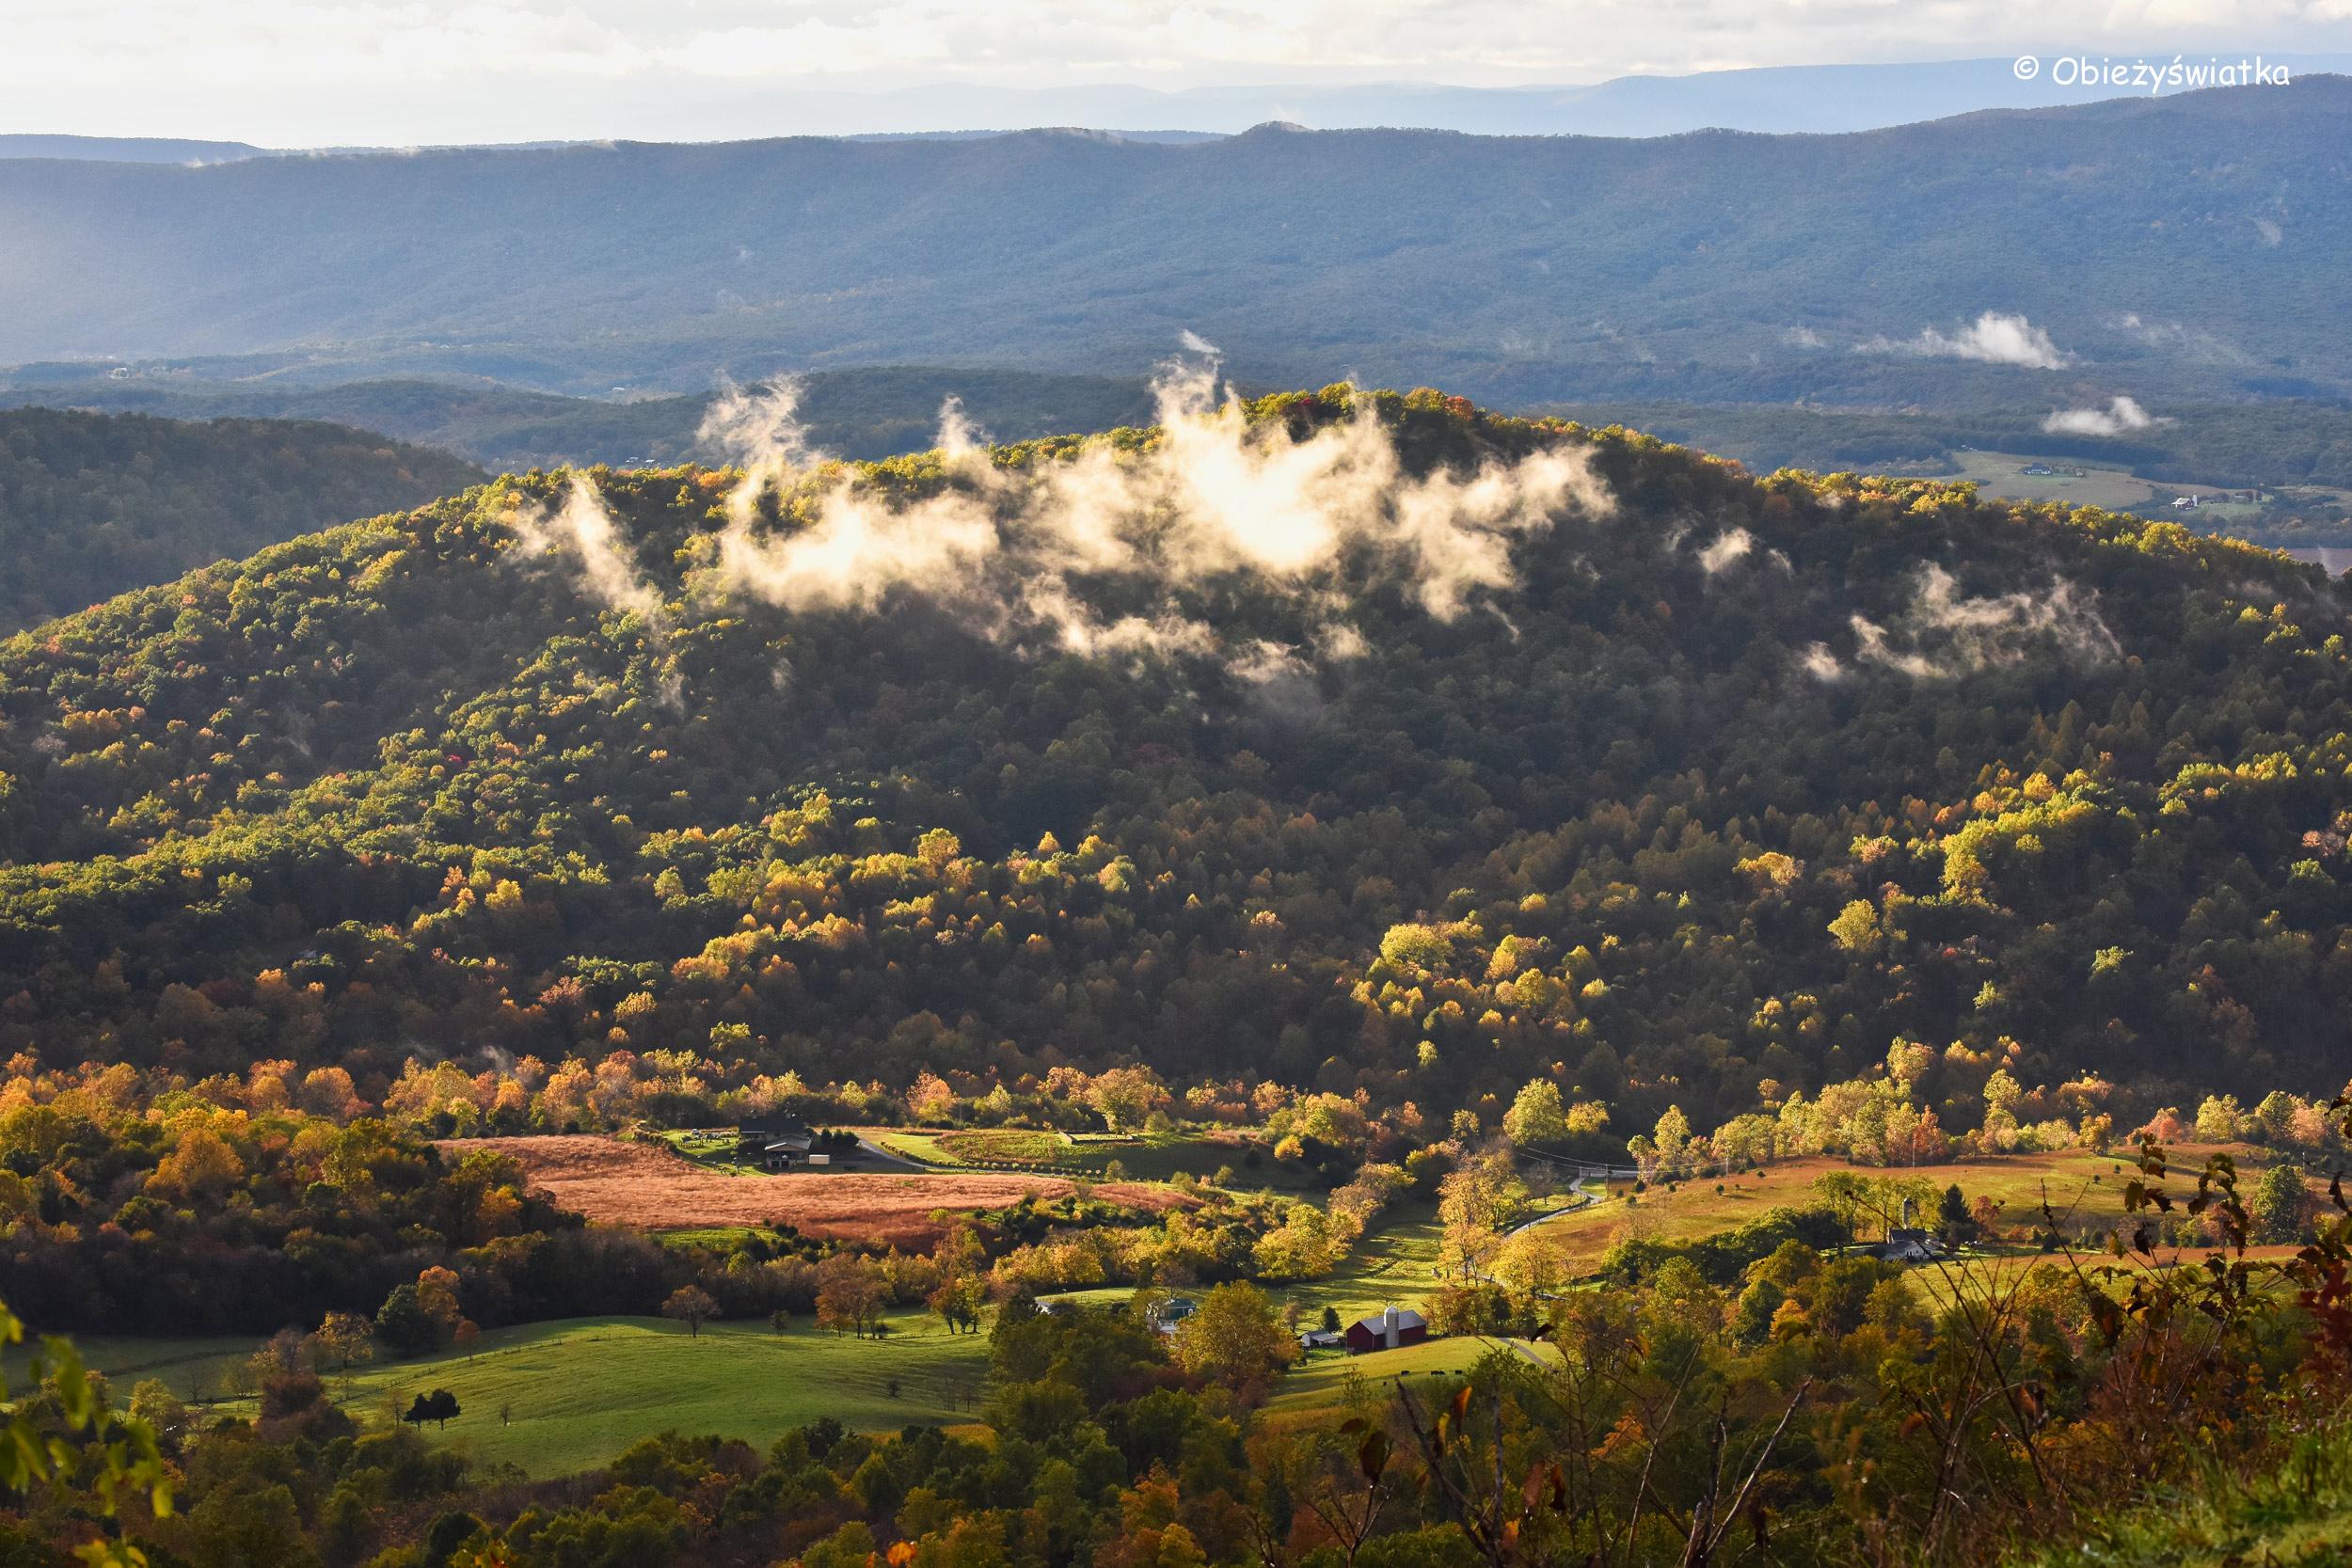 Widok na jedną z dolin - Park Narodowy Shenandoah, USA